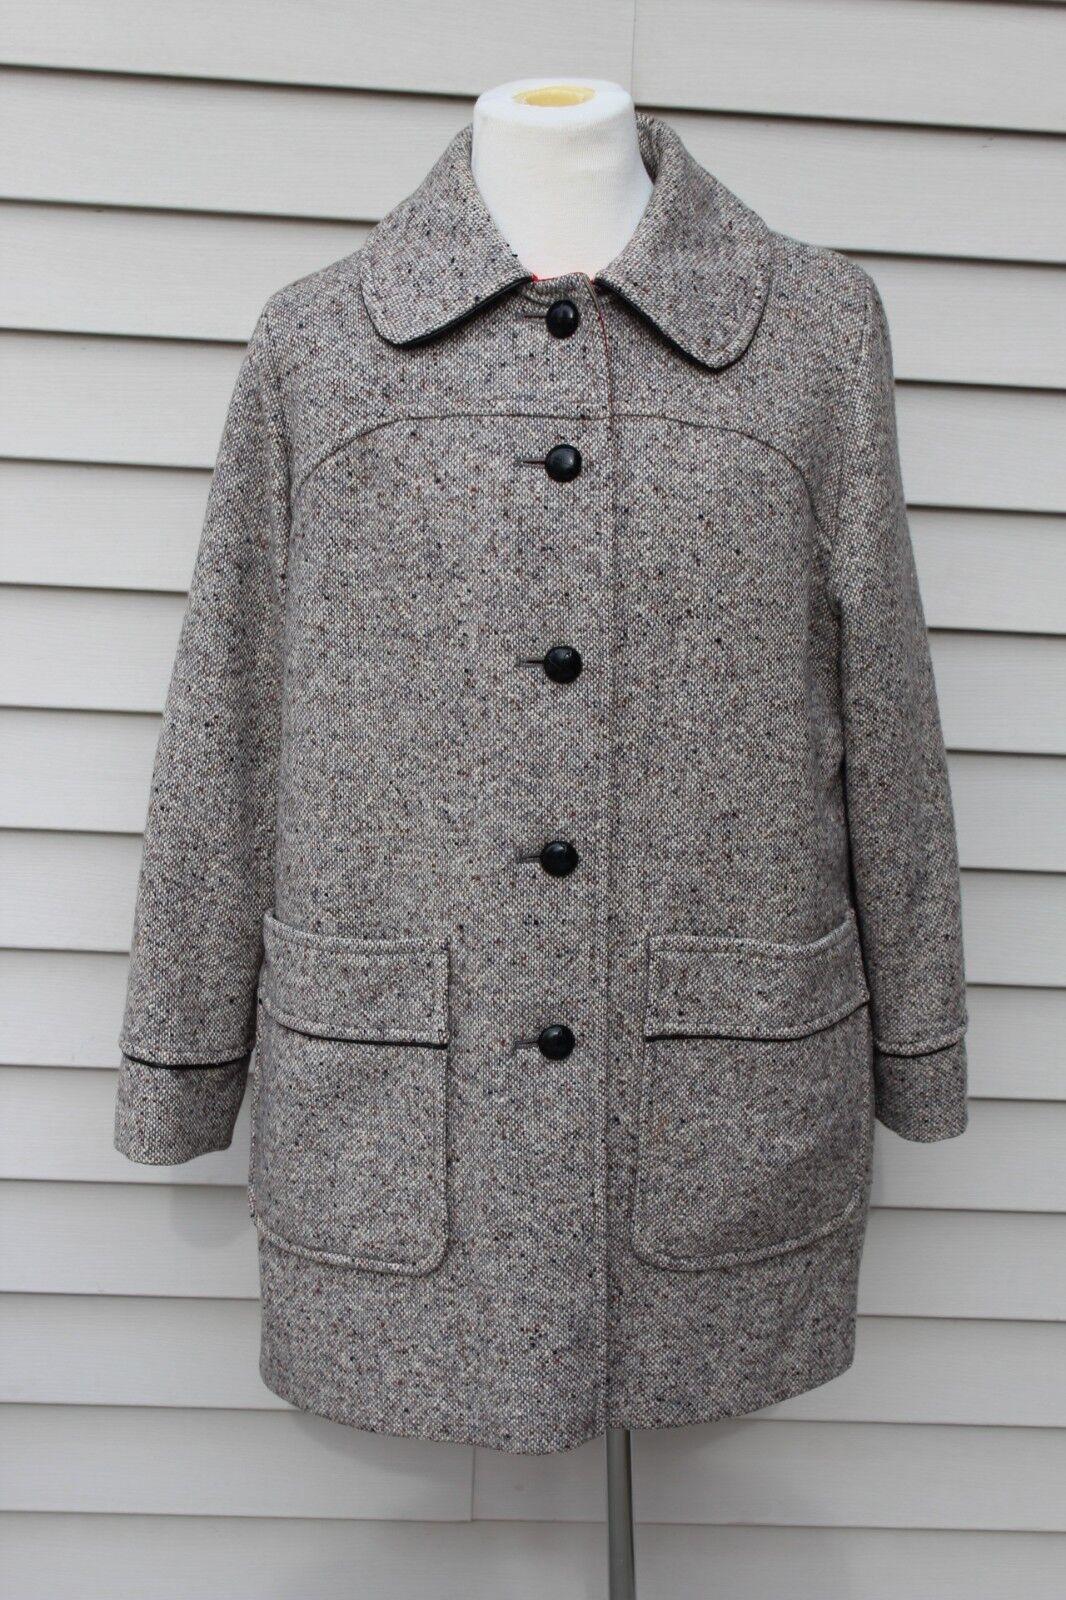 VTG Penguin Fashions Wool Blend Ladies Coat Plaid Leather Buttons Size 14 USA